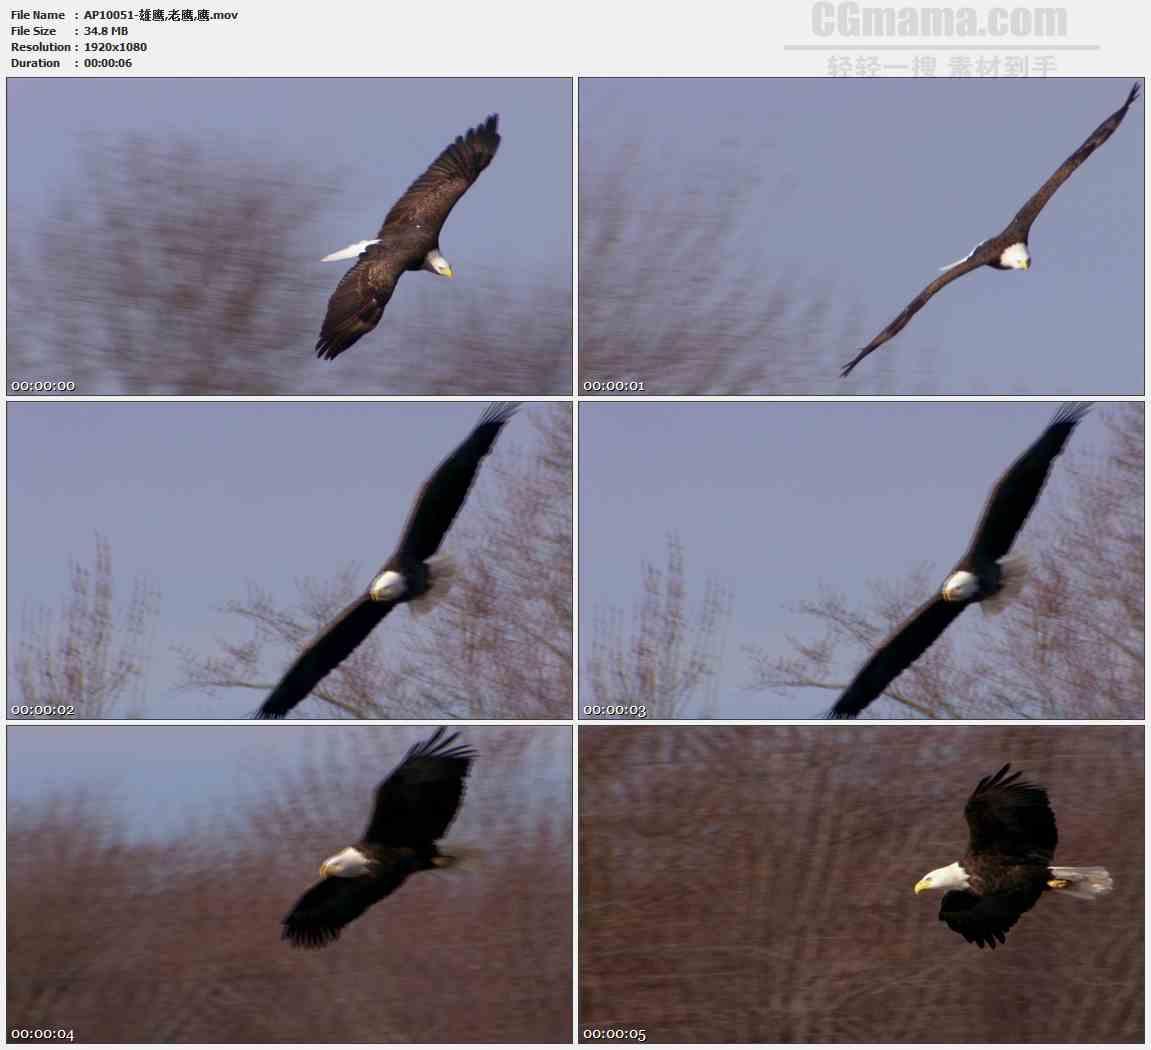 AP10051-雄鹰老鹰飞翔盘旋高清实拍视频素材